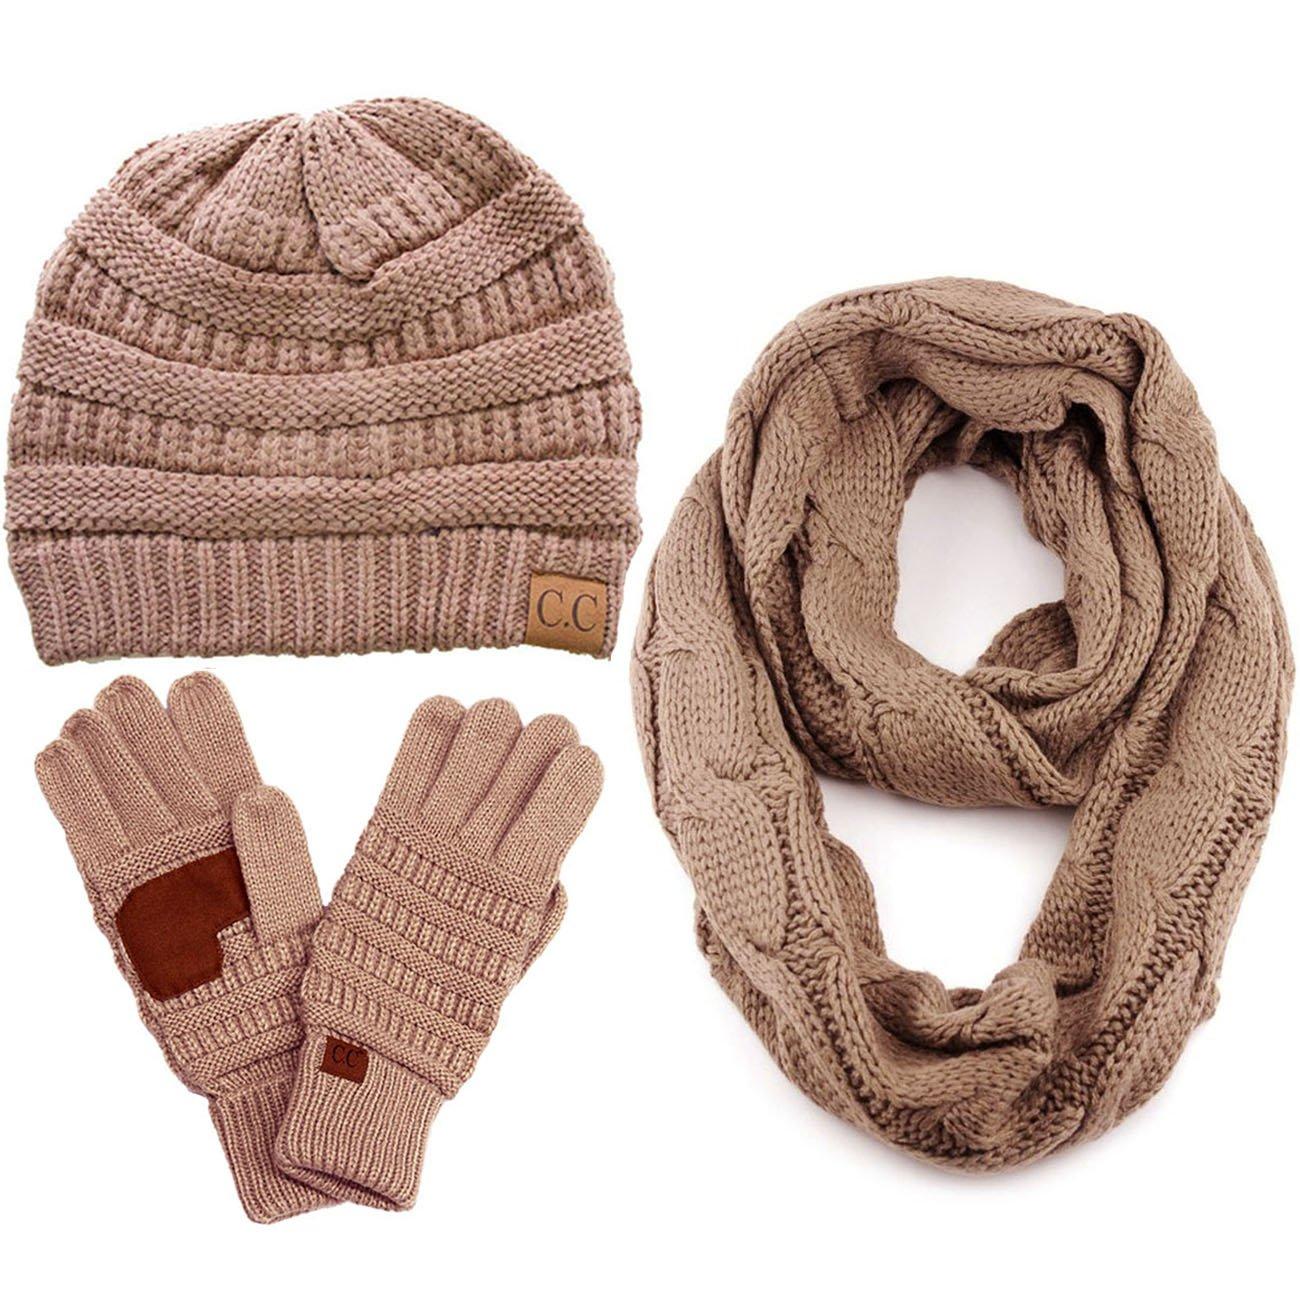 ScarvesMe CC 3pc Set Trendy Warm Chunky Soft Stretch Cable Knit Beanie Scarves Gloves Set (Taupe)